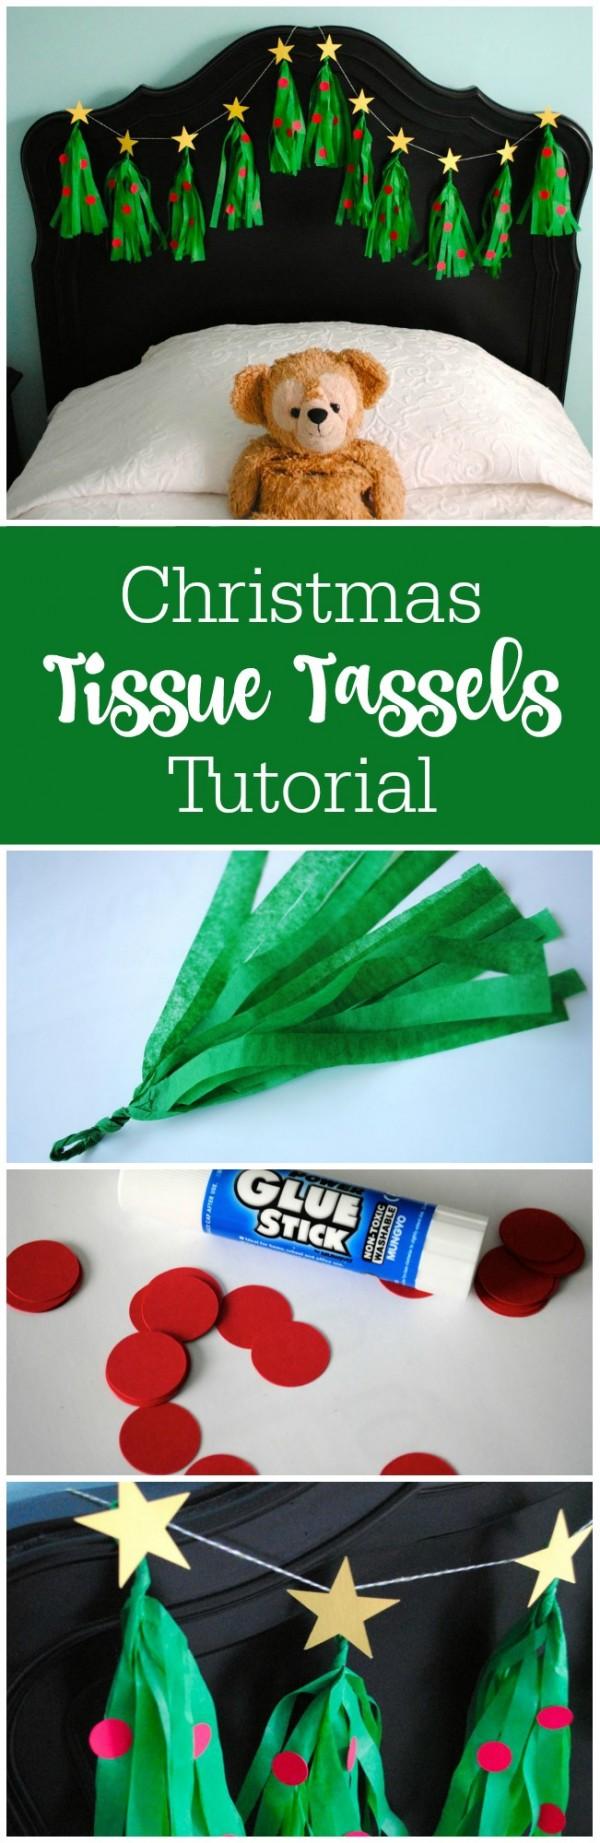 How to make Christmas tree tassel garland